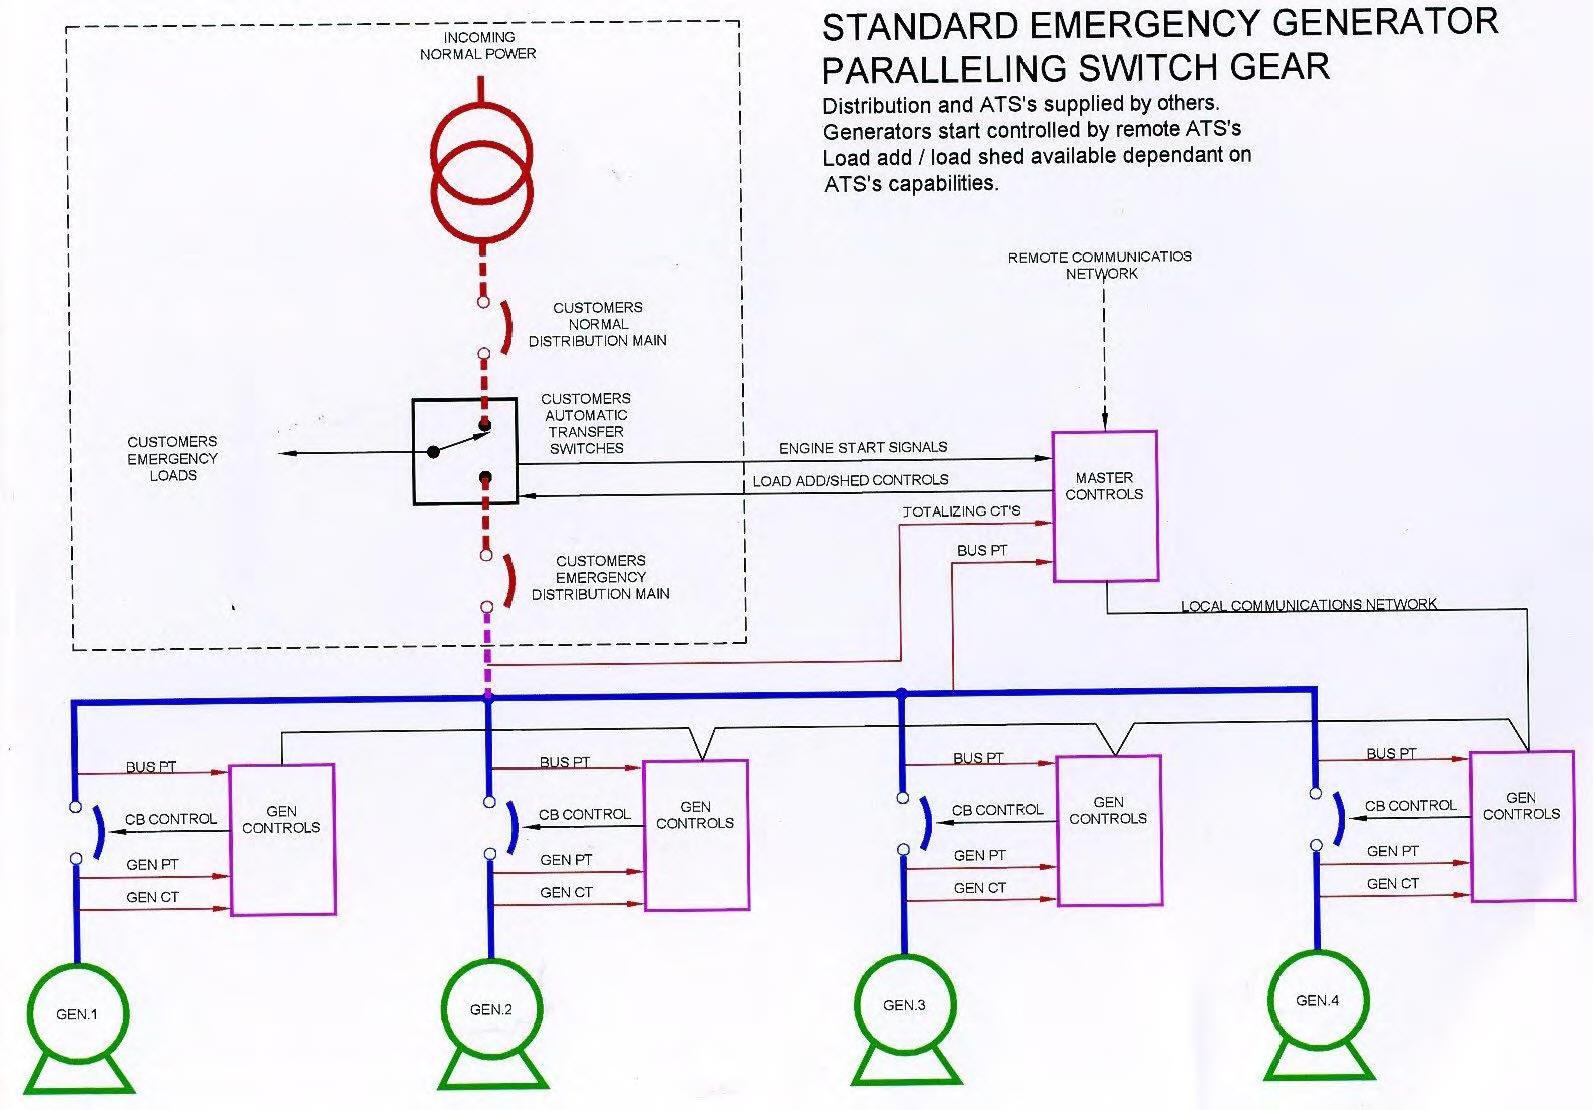 amstech power products custom controls rh favoritevendor com Generator Transfer Switch Manual Generator Transfer Switch Wiring